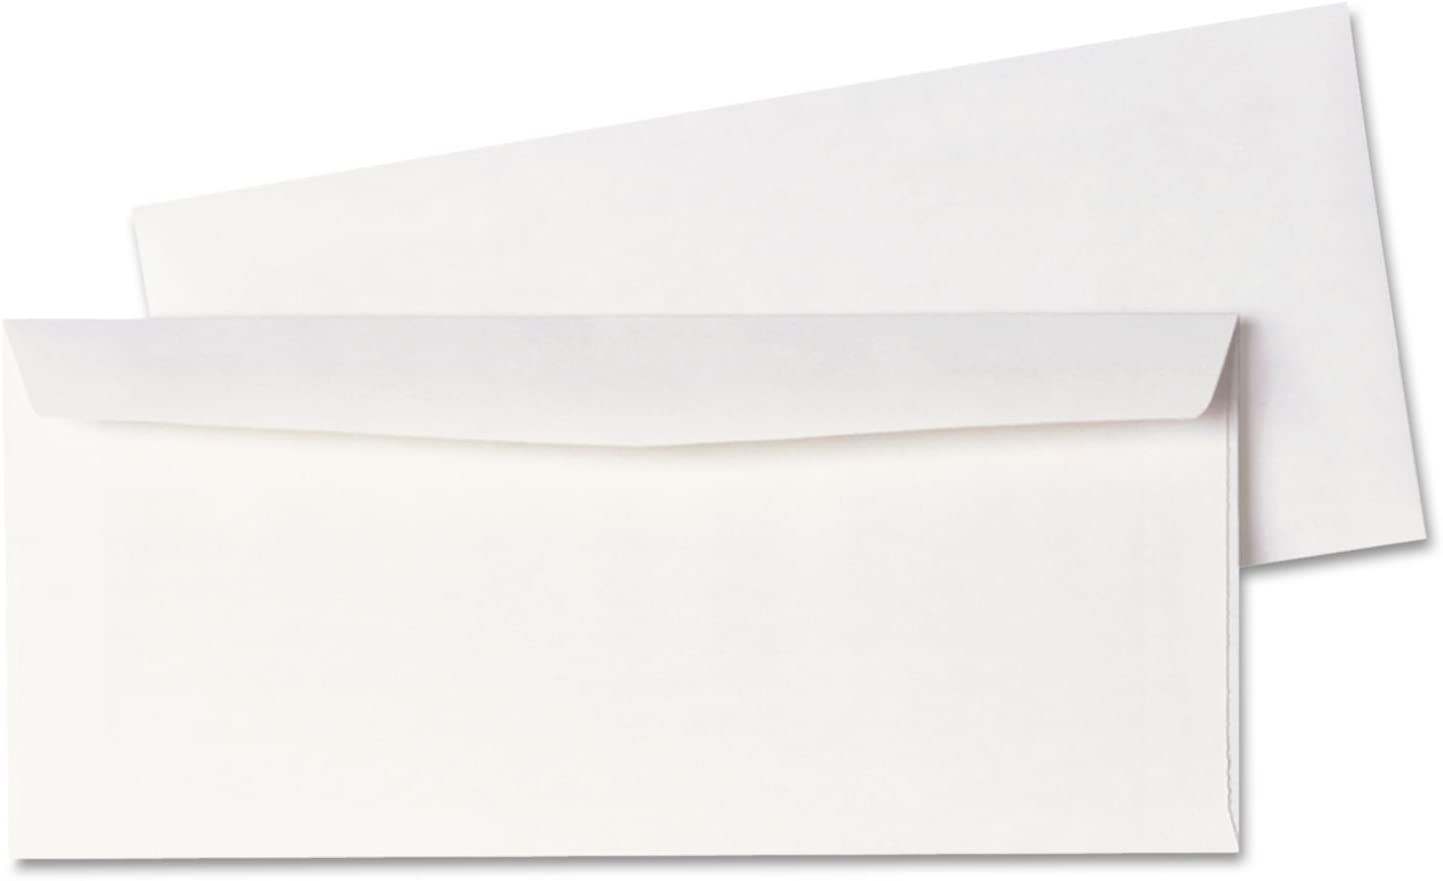 Quality Park No.10 Business Envelope 4-1 500 8 online shop White 9-1 Max 76% OFF x 2